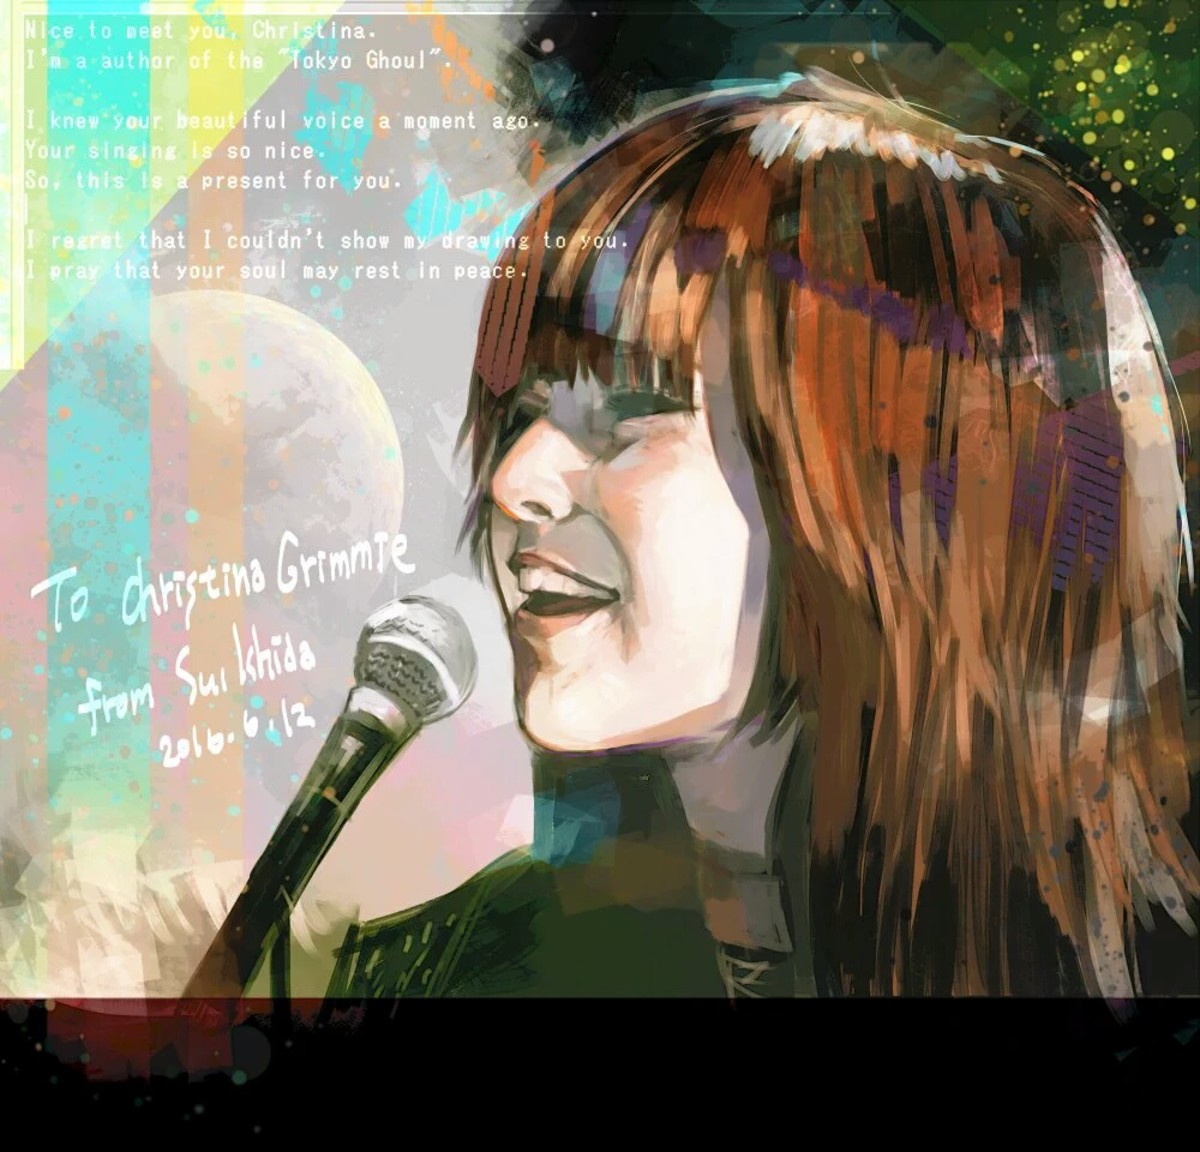 Ishida's tribute to Christina Grimmie.